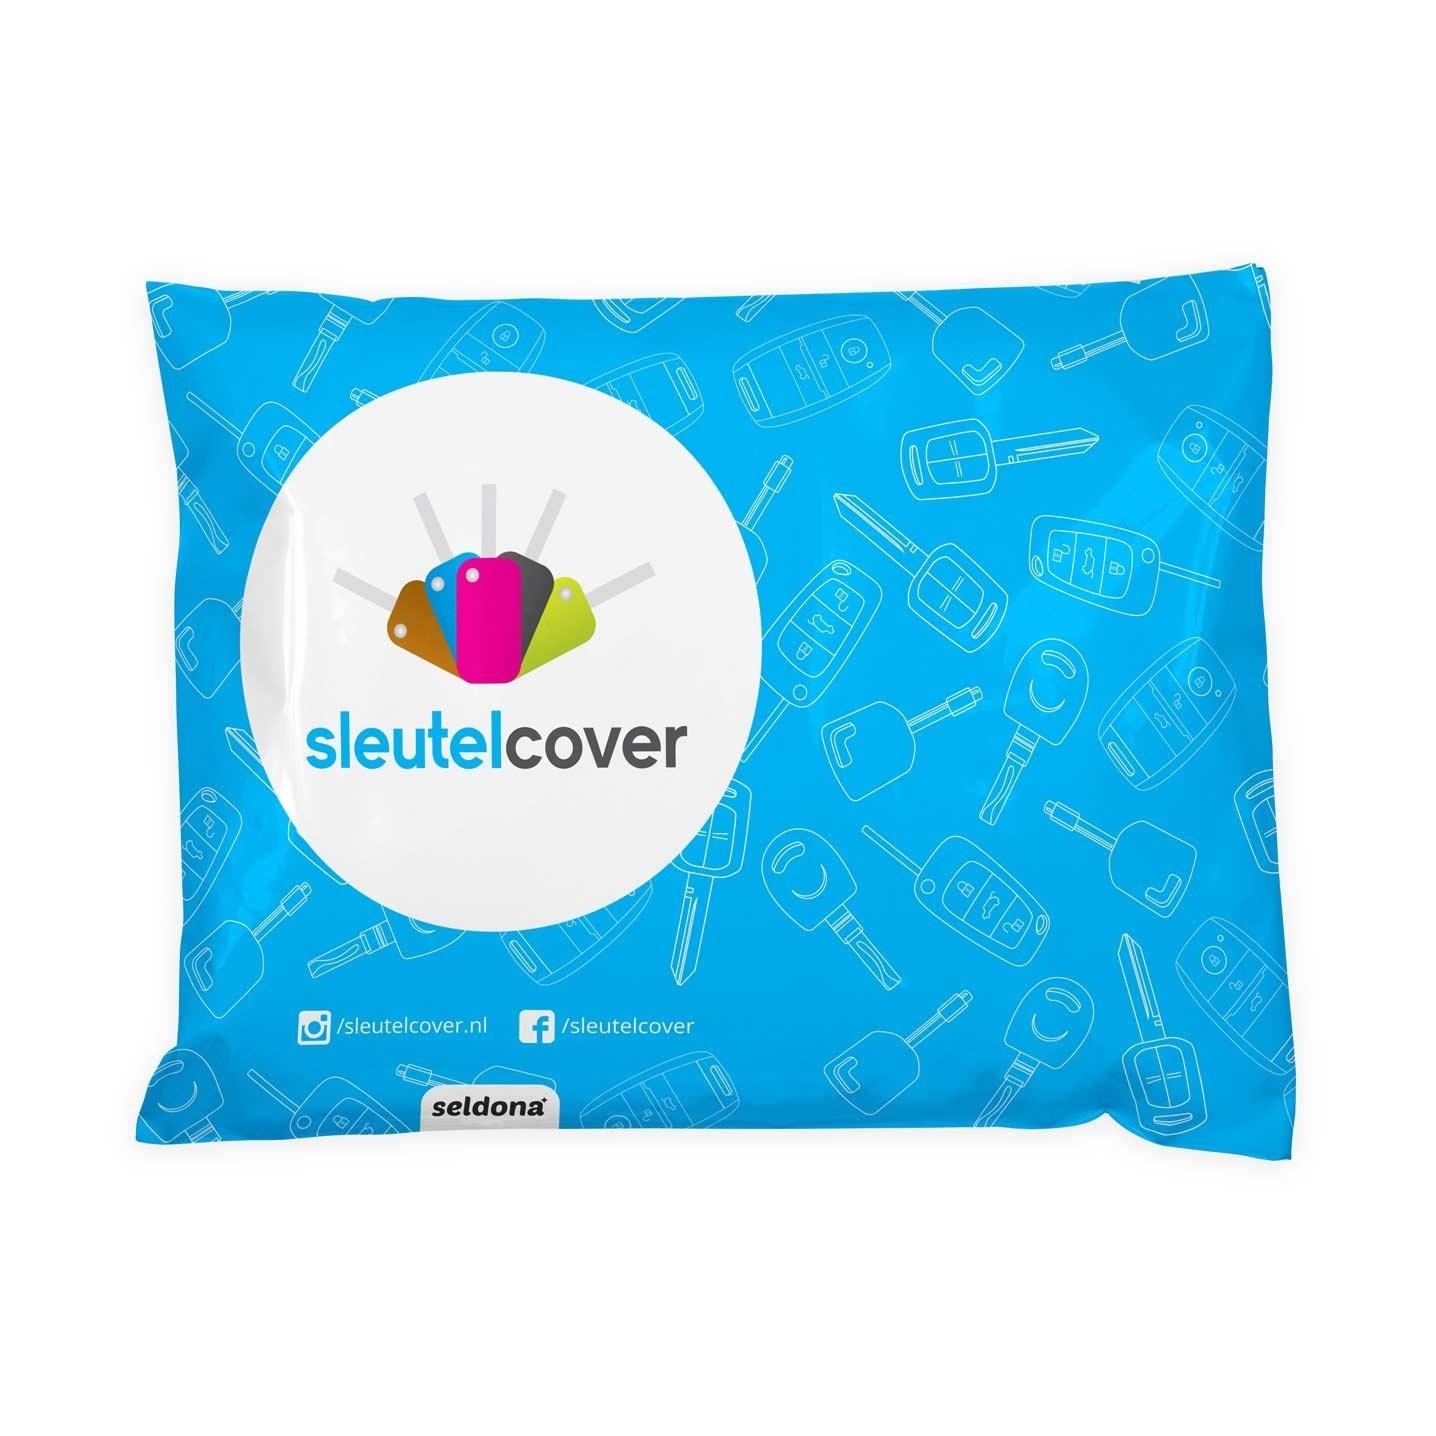 Volvo SleutelCover - Blauw / Silicone sleutelhoesje / beschermhoesje autosleutel